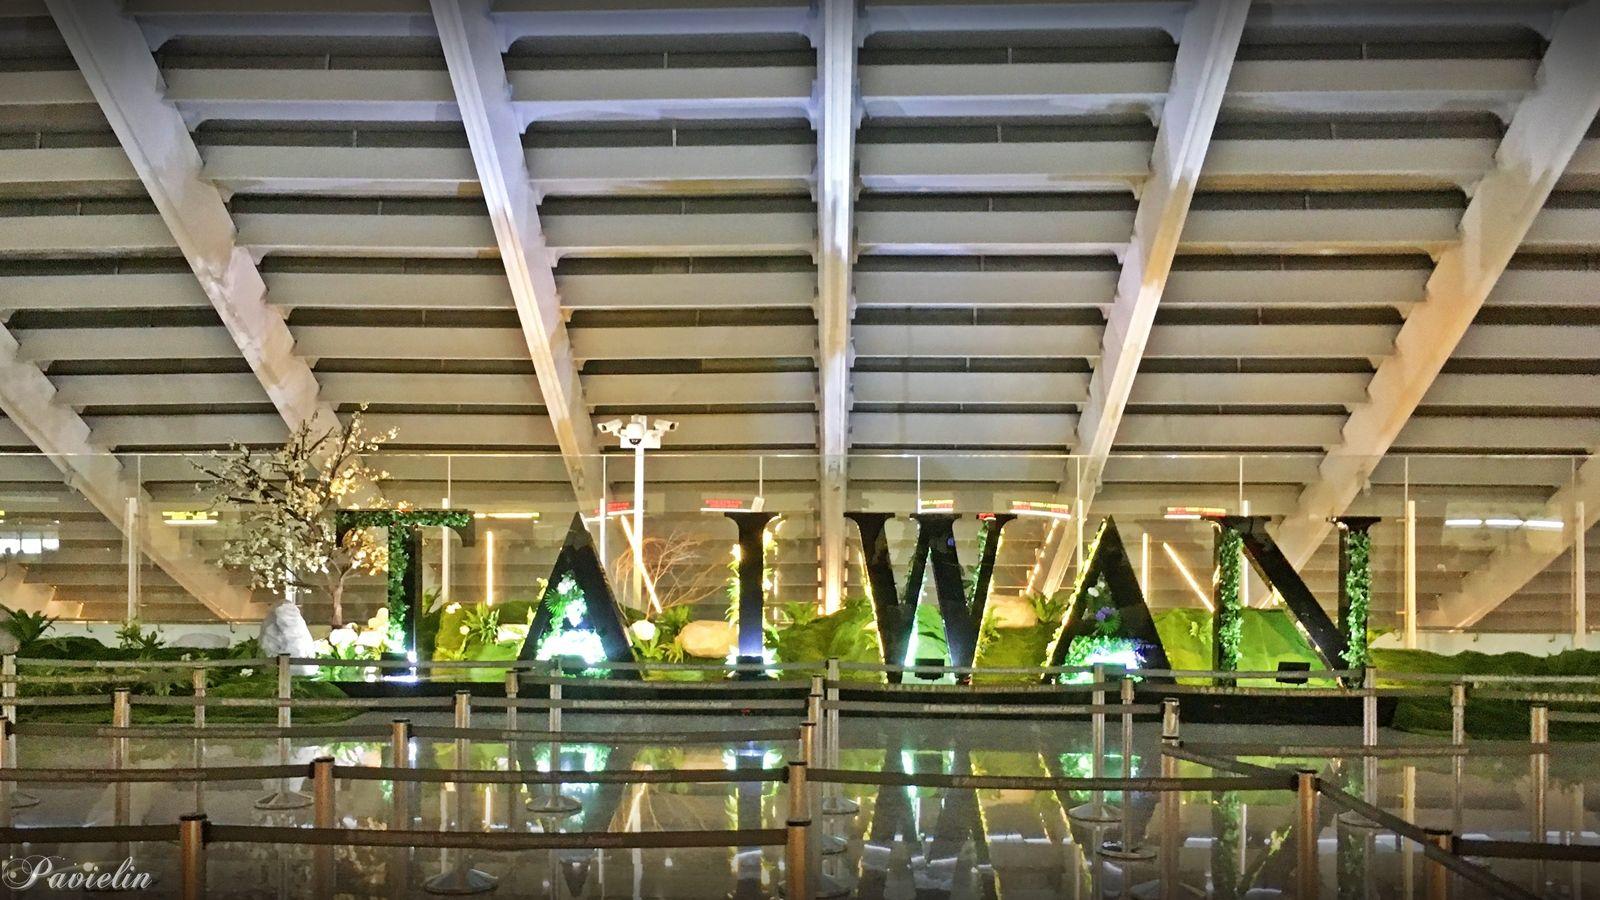 Trip,Travel,Taoyuan,Taiwan,台湾,桃園,เที่ยว,ไต้หวัน,ไทเป,ที่เที่ยว,ที่นอน,กิน,เถาหยวน,ประหยัด,งบน้อย,ทริป,กี่บาท,ด้วยตัวเอง,โรงแรม,Amazing,Ynotfly,Miramar,Group,Wonderful,Package,Tiger,Airline,TigerAir,台灣虎航,hotel,travel,水晶晶,ถูก,โปรแกรม,ไทเกอร์แอร์,รีวิว,มิราเคิลเลานจ์,สนามบิน,แท็กซี่,เข้าเมือง,เดินทาง,Miracle,Lounge,Airport,Taxi,เครื่องบิน,ราคาถูก,โปร,Review,klook,kkday,airbnb,sleeping,point,นอน,Gopro,Hero7,แจก,แพลน,ขึ้นเครื่องบิน,เรียก,ดูให้รู้,F.I.T.,วางแผน,เพื่อน,บอกโปร,泰国,航空,ตั๋ว,เก้าอี้